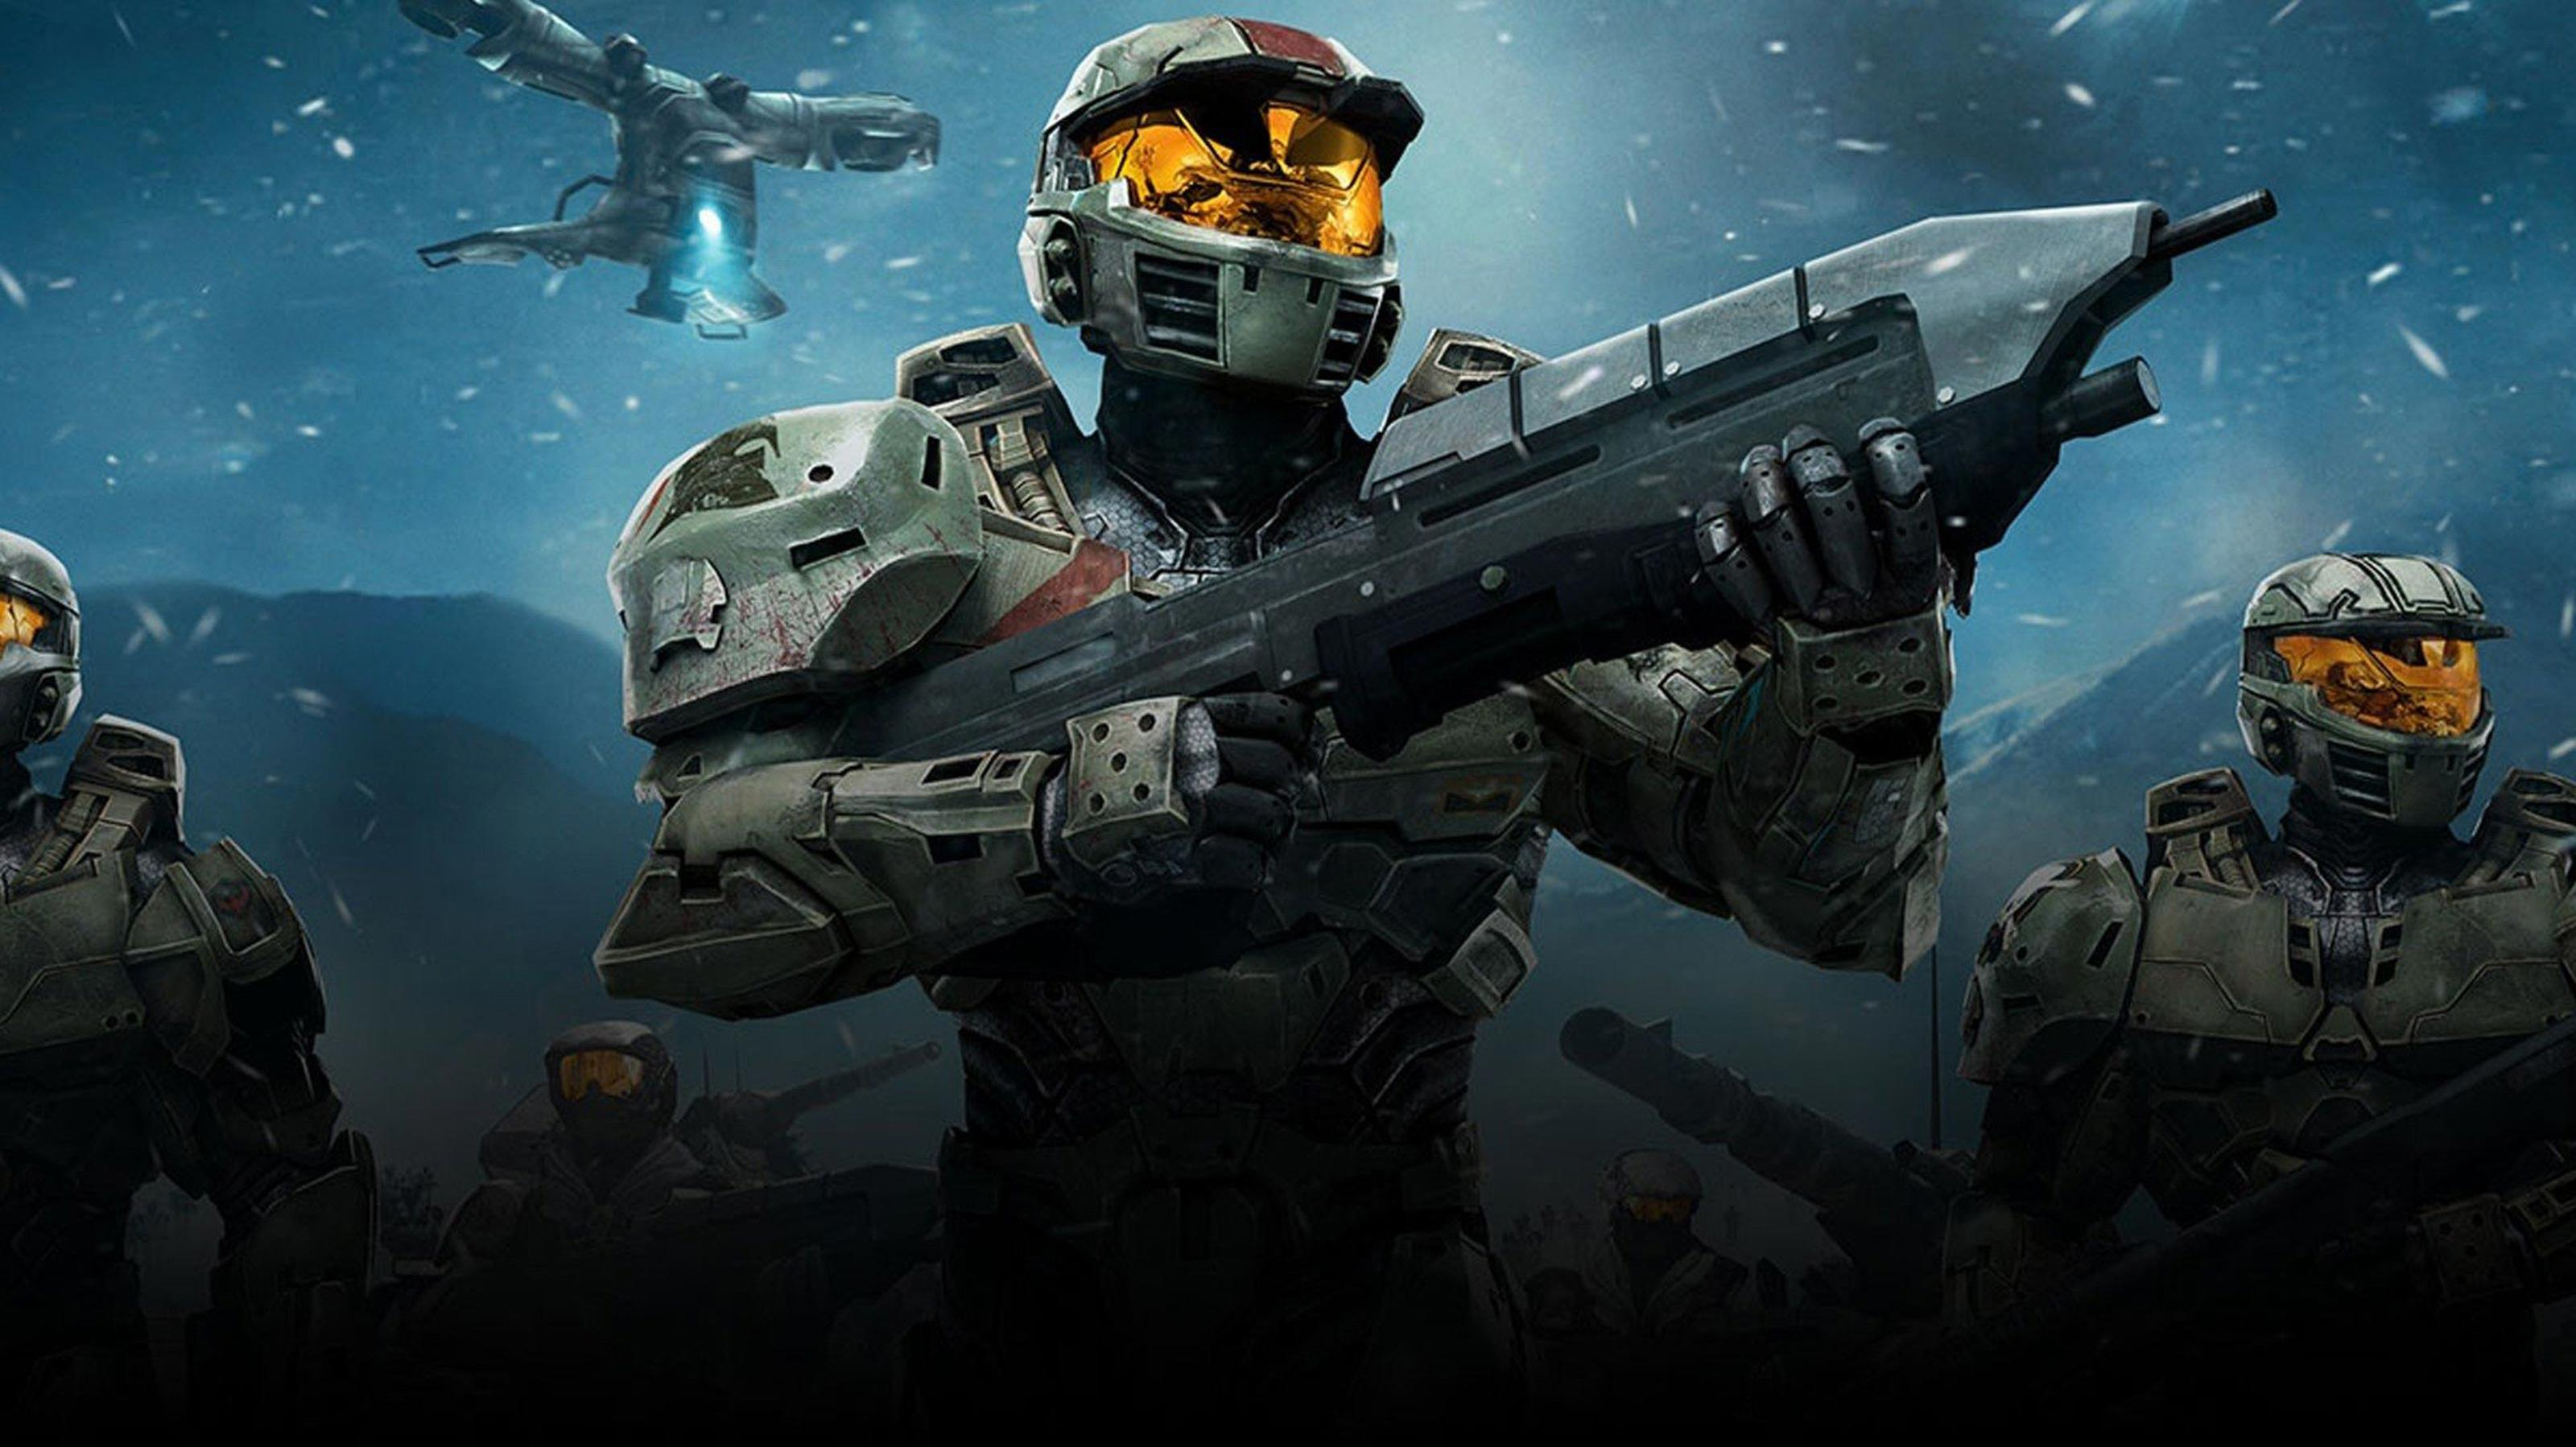 O game Halo